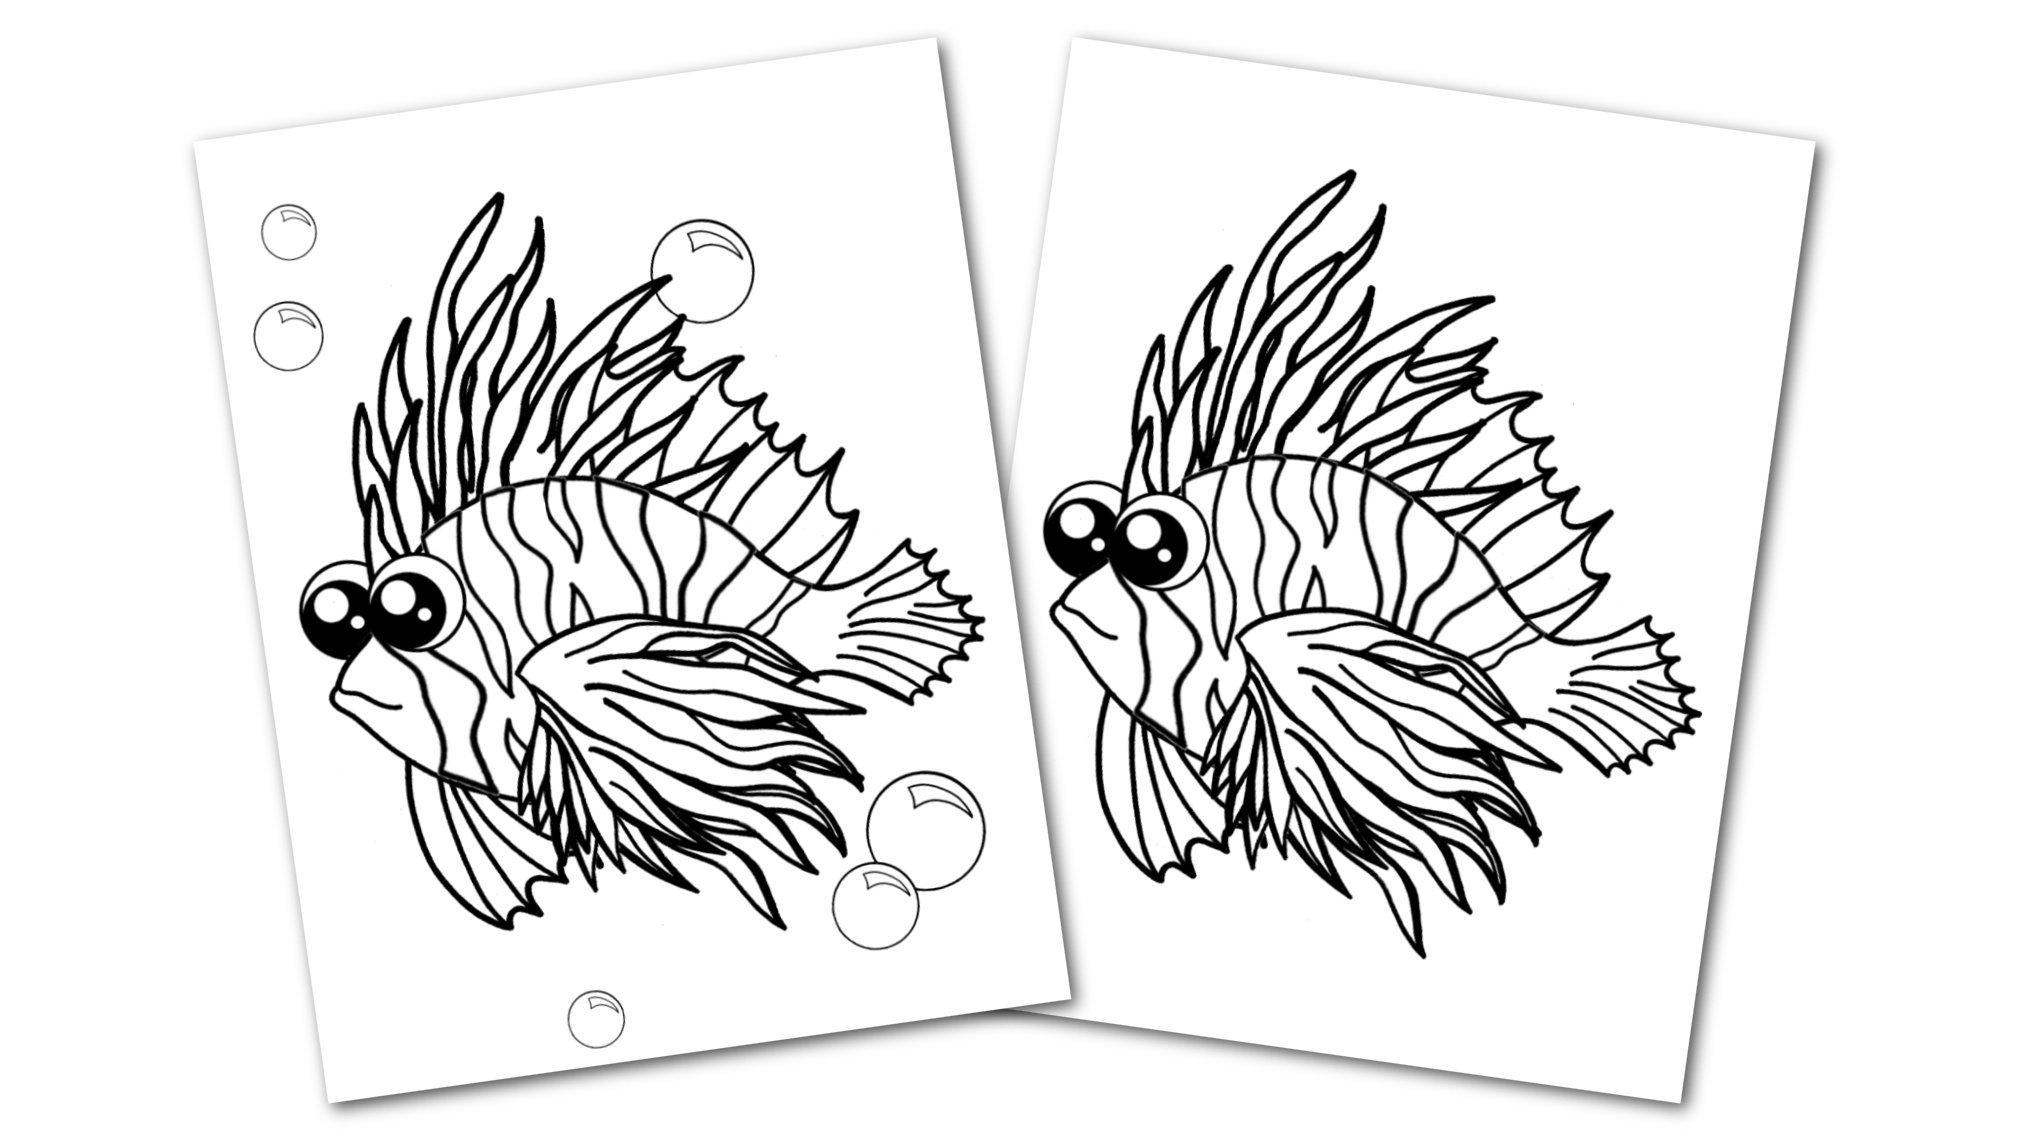 Free Printable Lionfish Ocean Animal Convertkit for Toddlers, Kids and Preschoolers